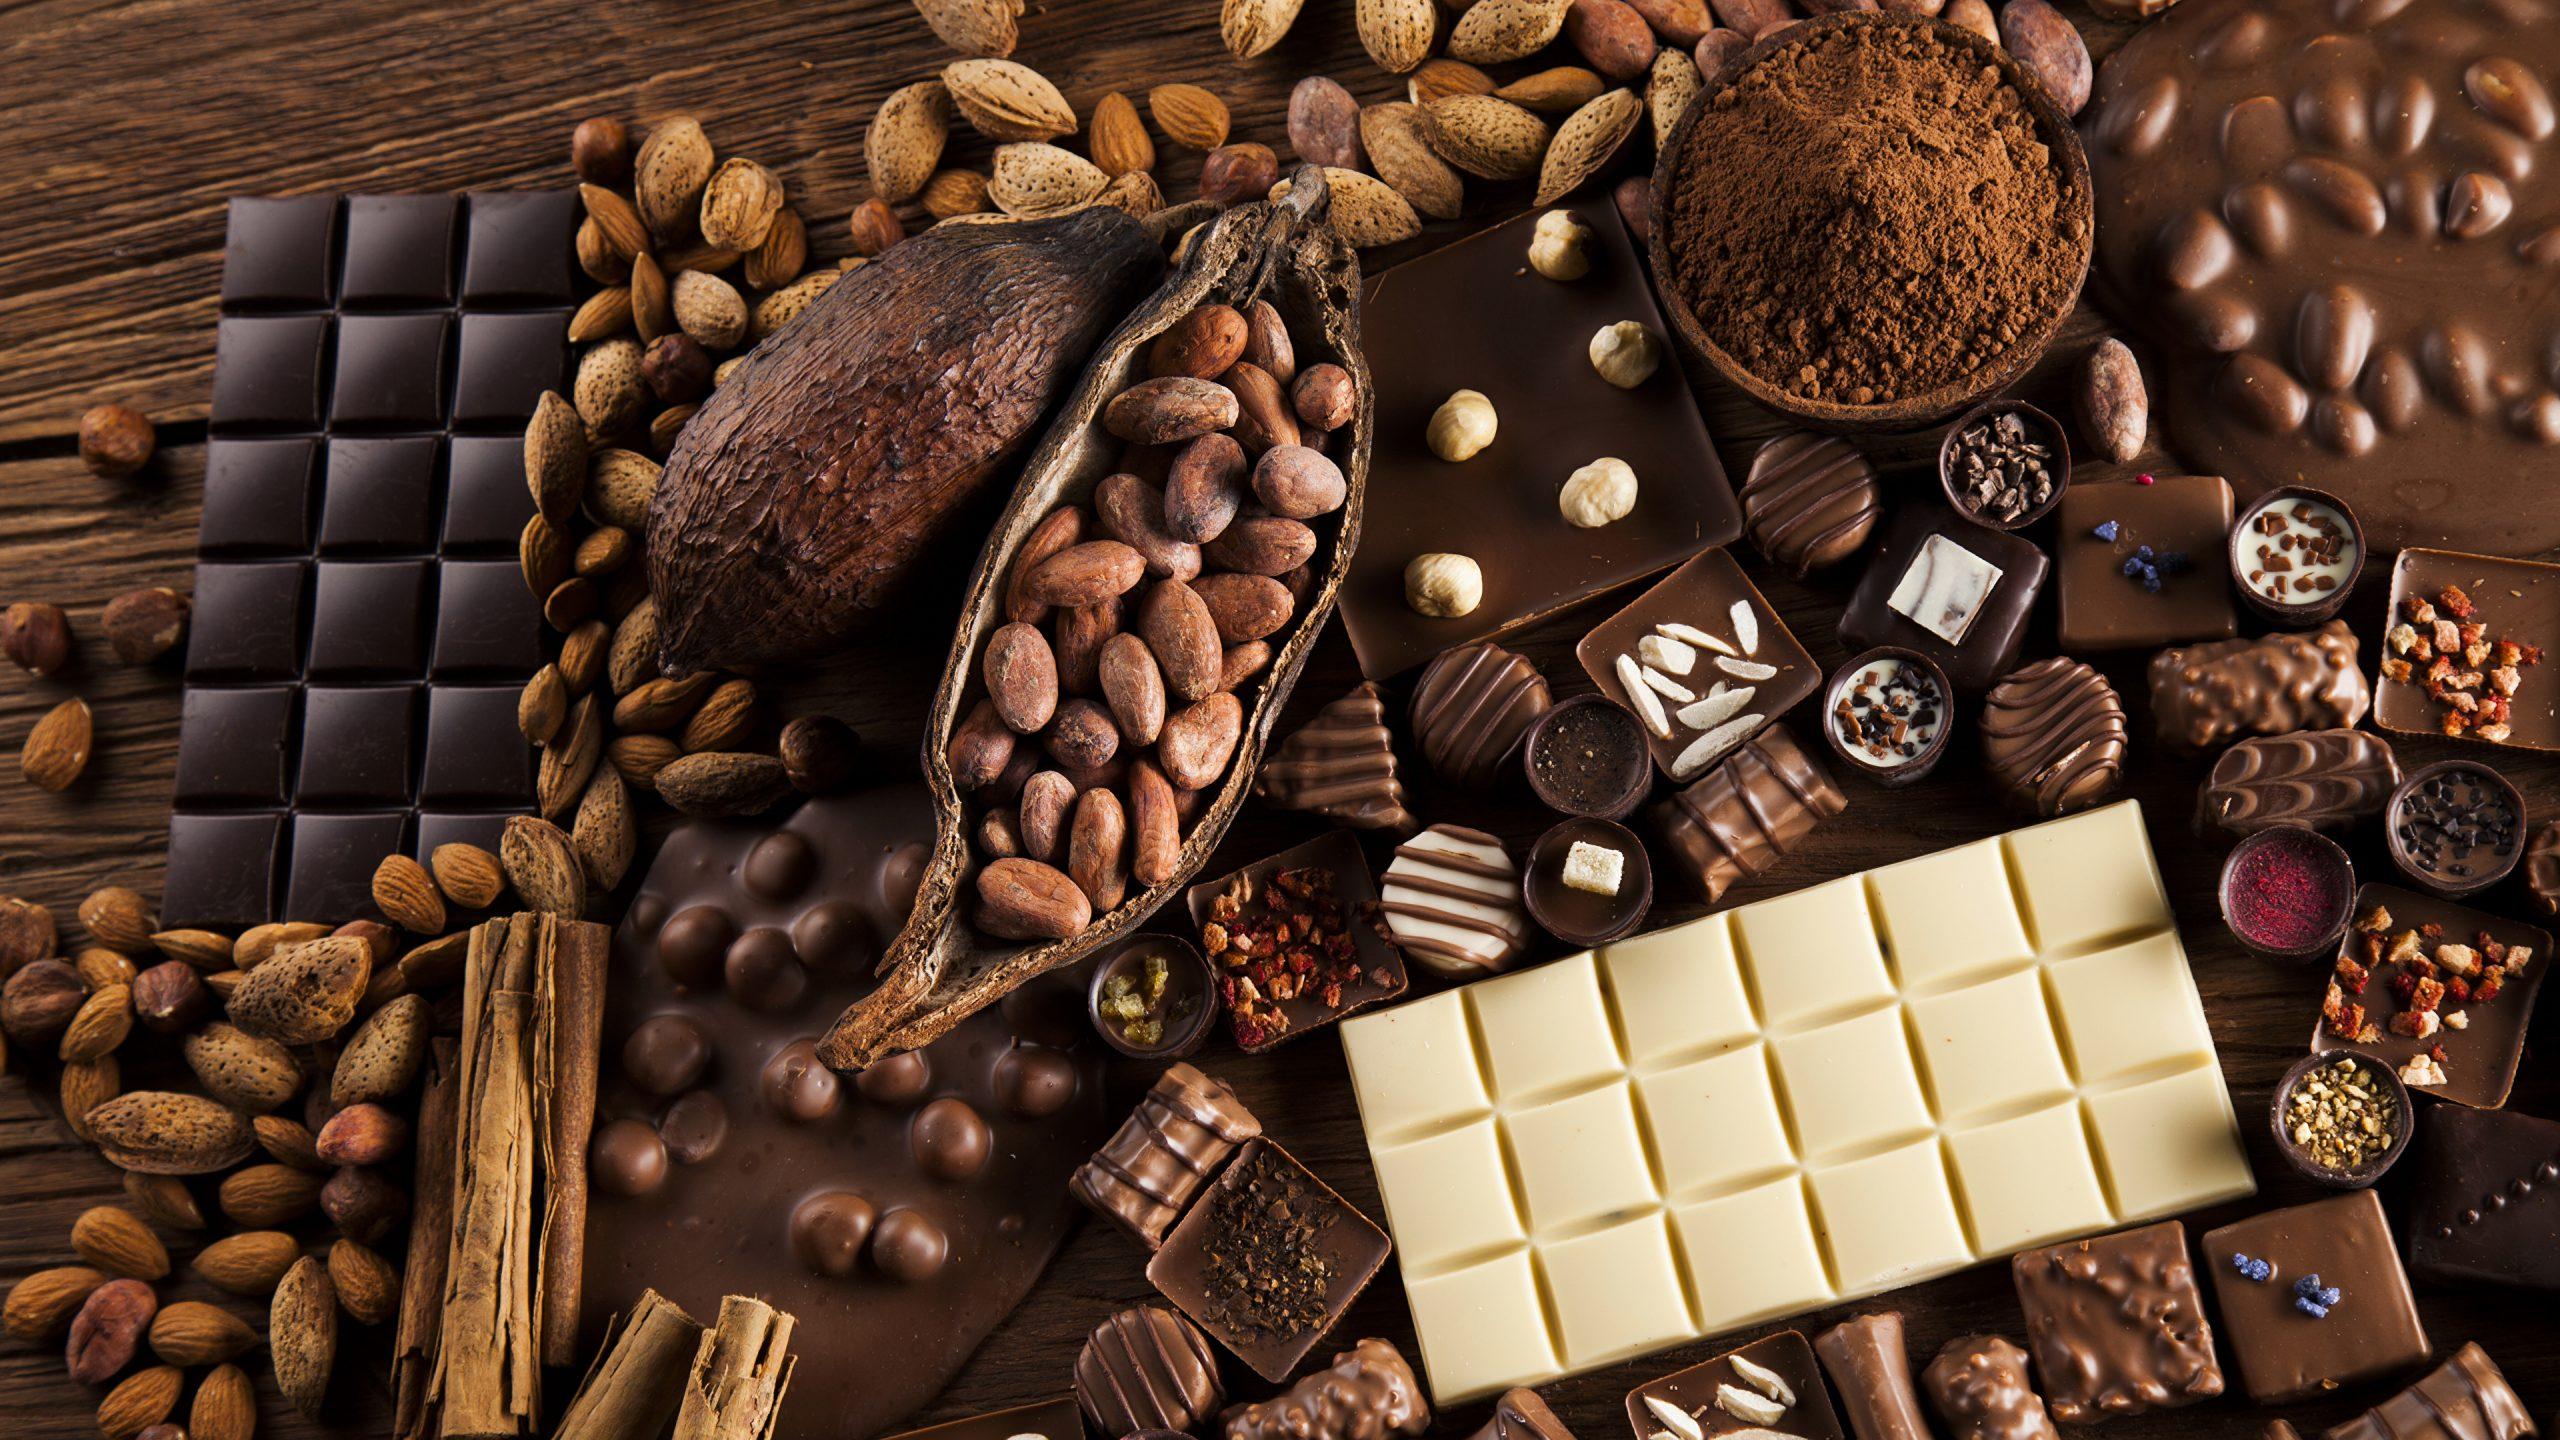 Chocolate Festivals over the Caribbean